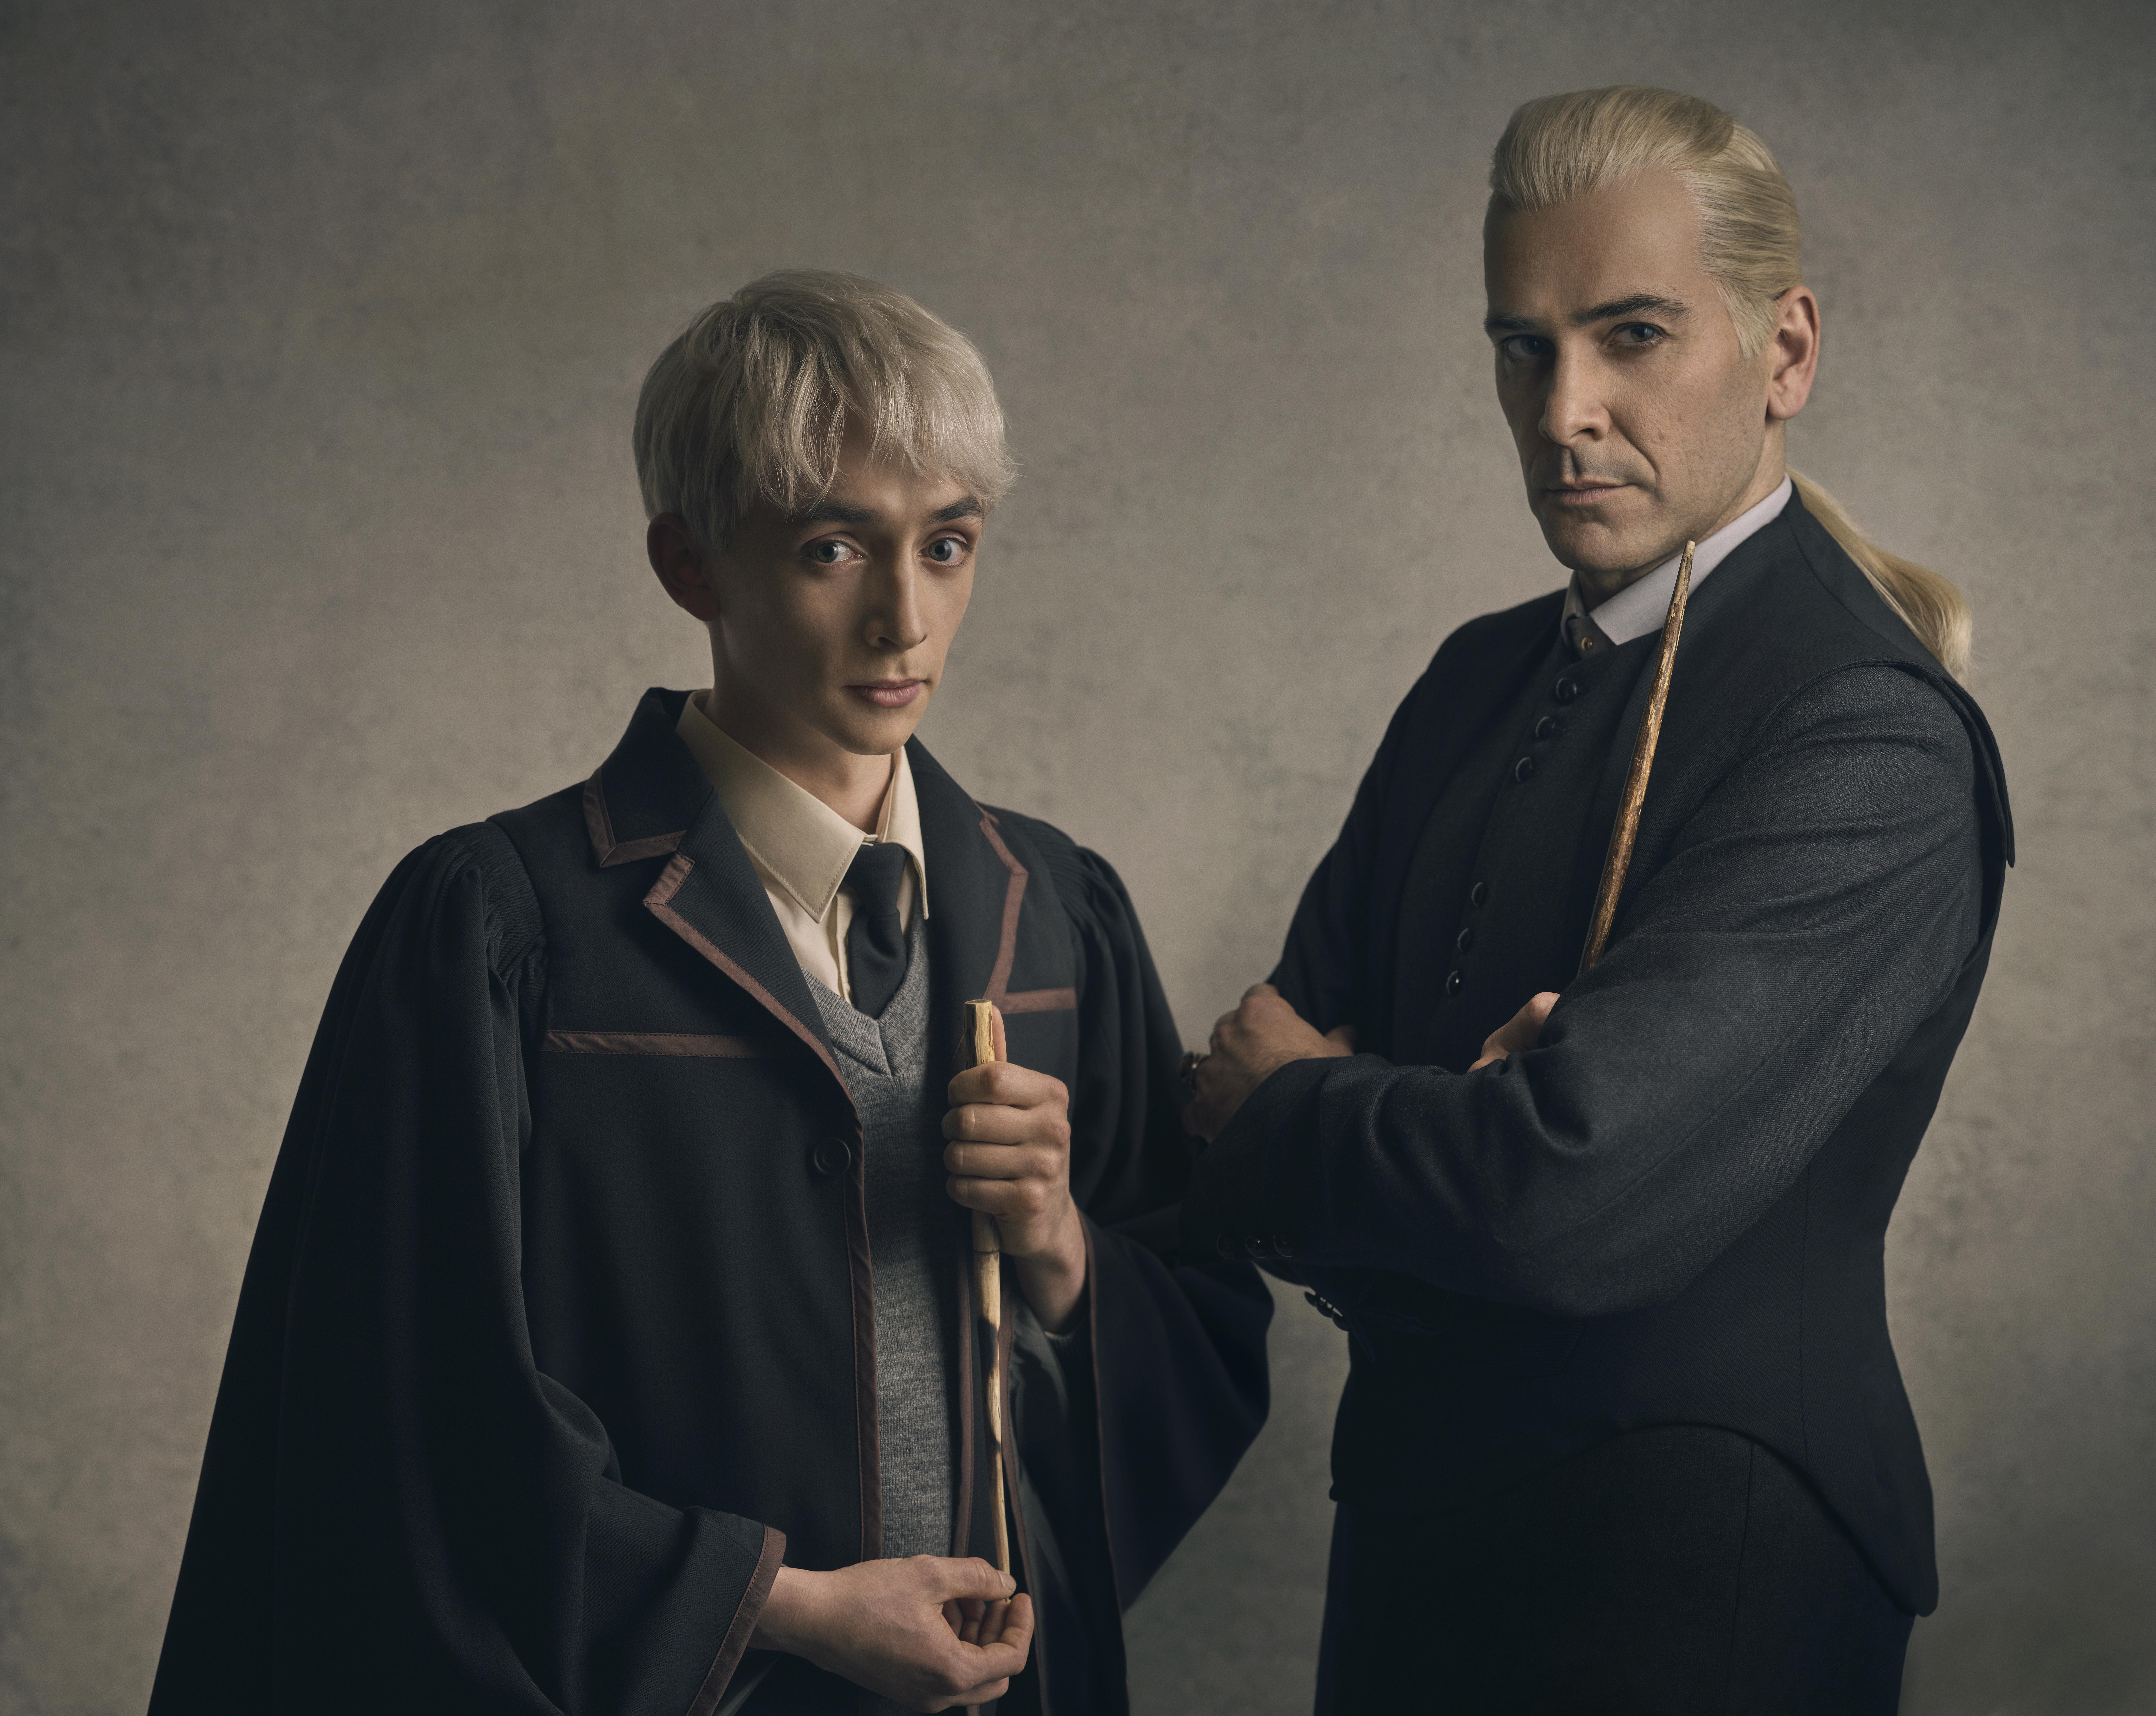 Samuel Blenkin as Scorpius Malfoy and James Howard as Draco Malfoy.